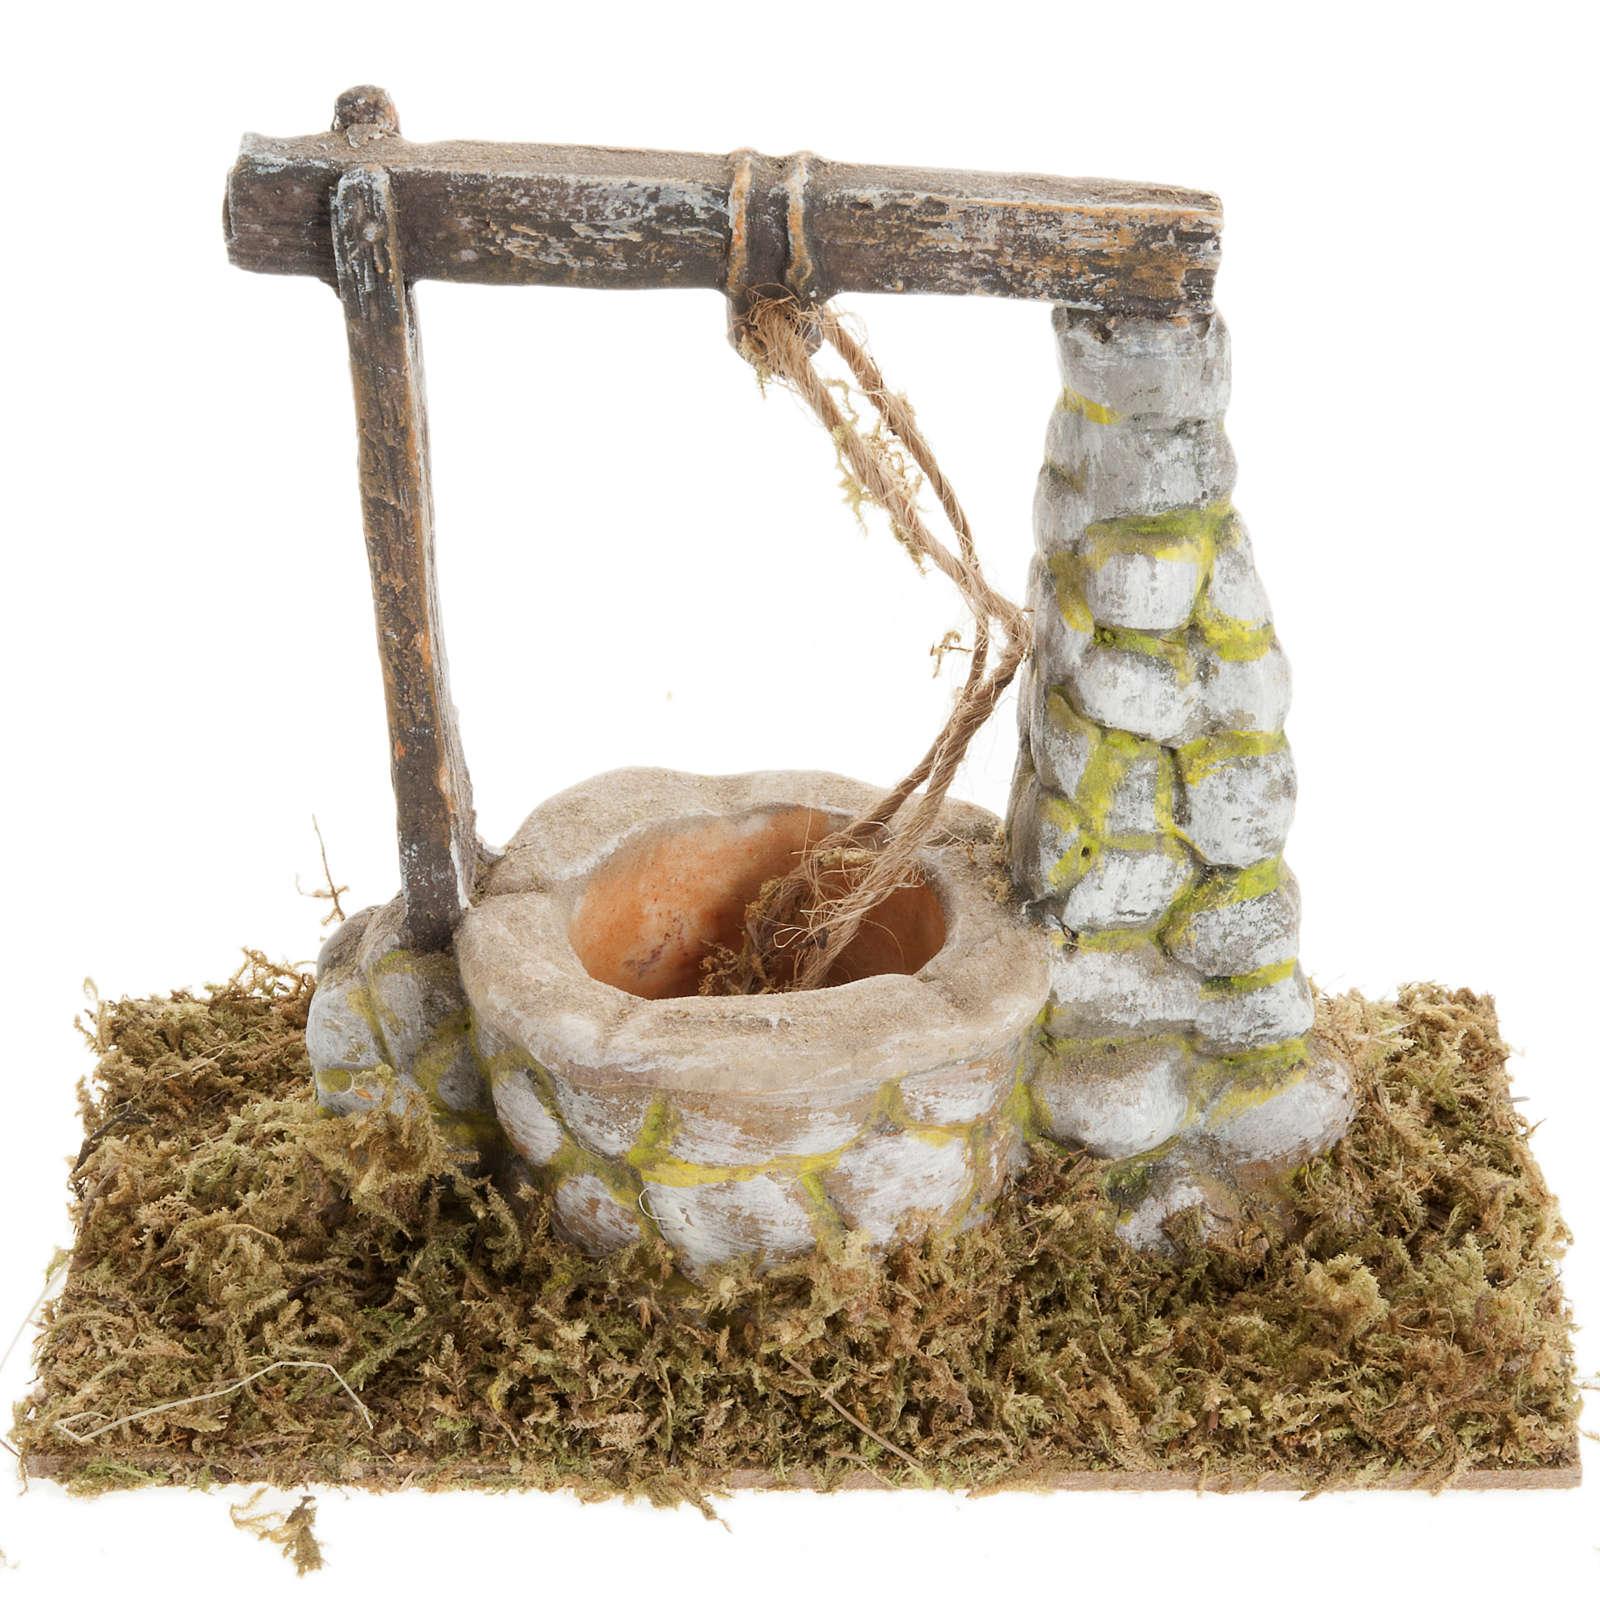 Puits en miniature crèche Noel 8x15cm 4